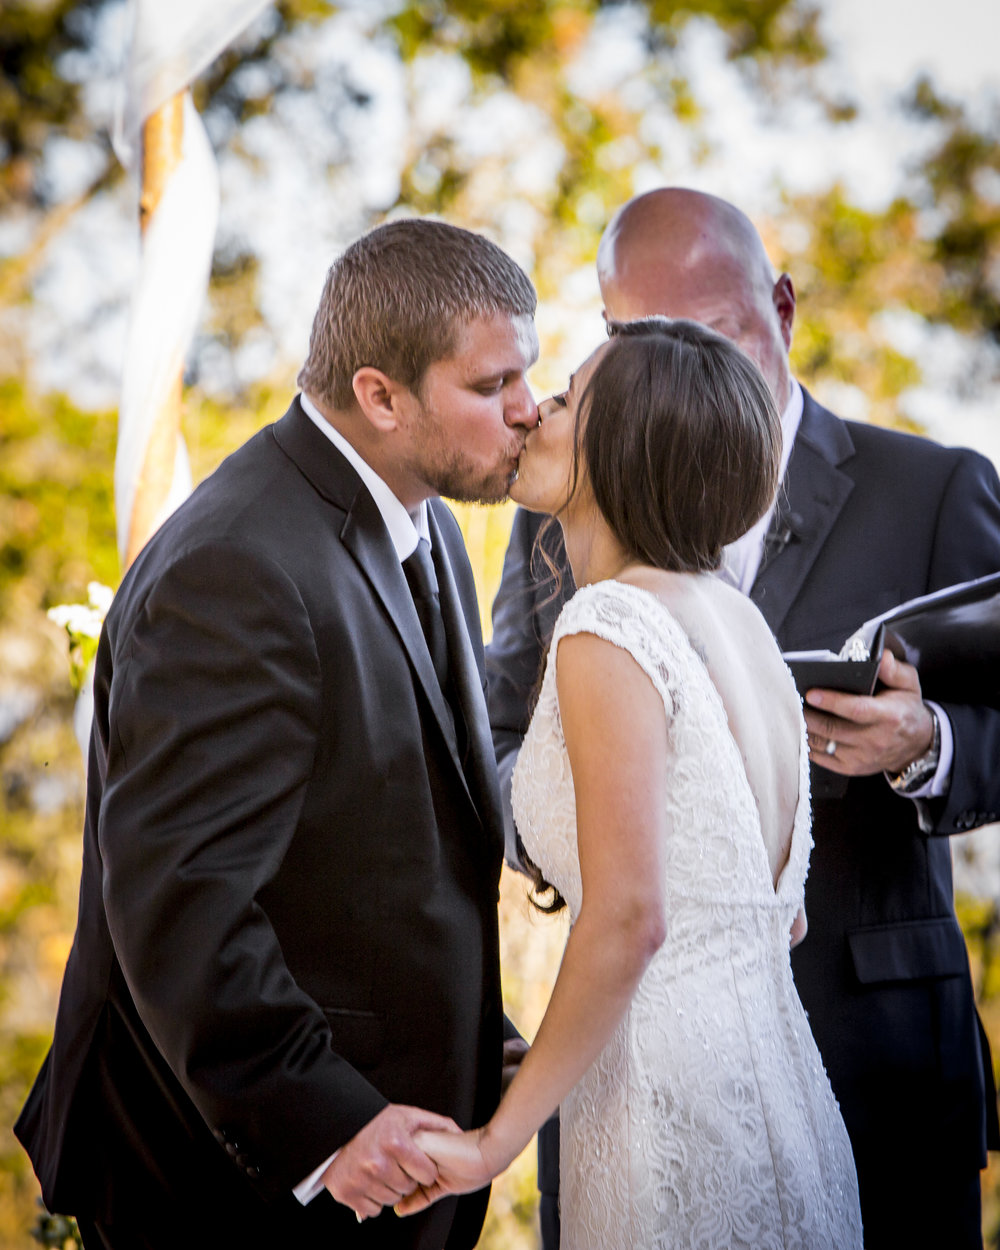 Ceremony-2759-2.jpg